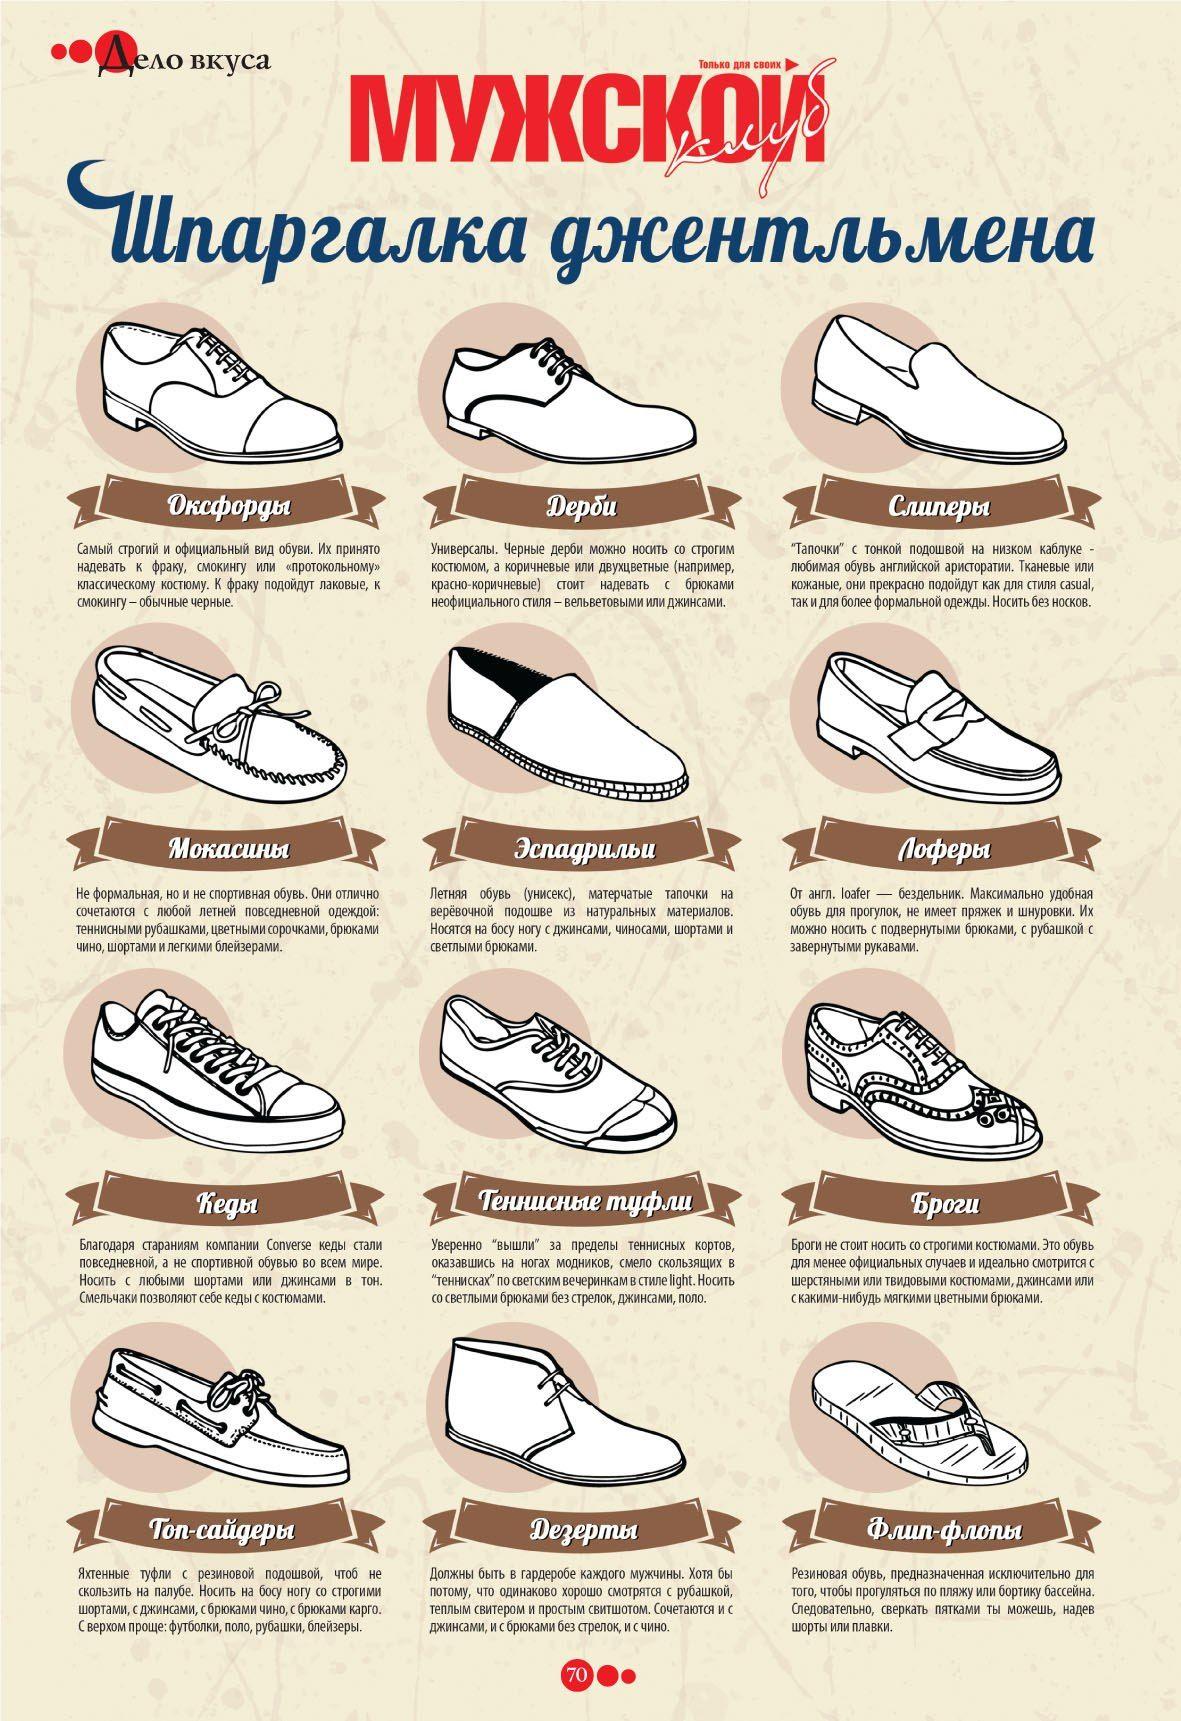 Виды мужской обуви   Инфографика   Pinterest   Mens fashion, Fashion ... 645ab43397b